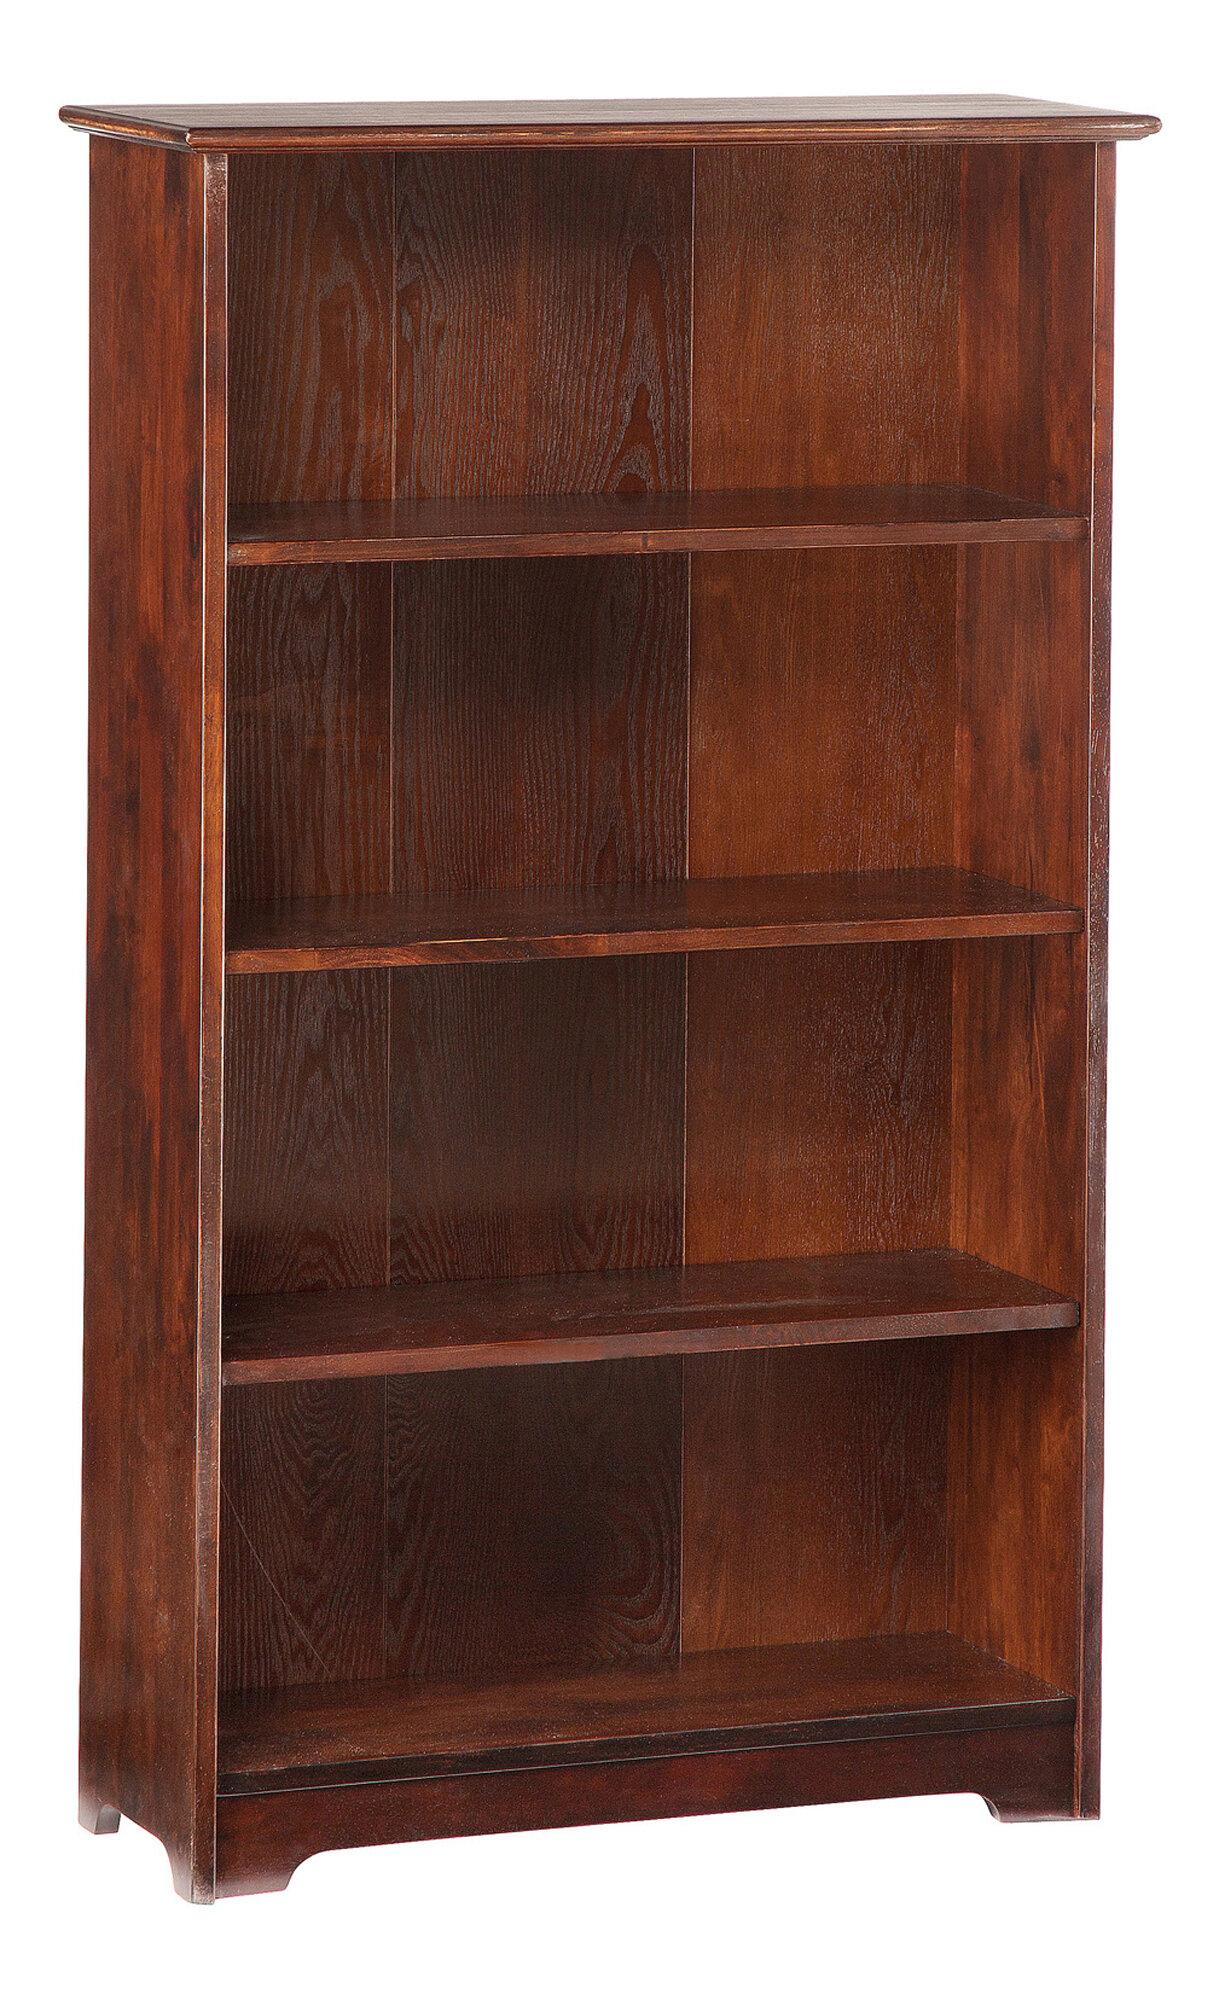 Trepagnier Standard Bookcase